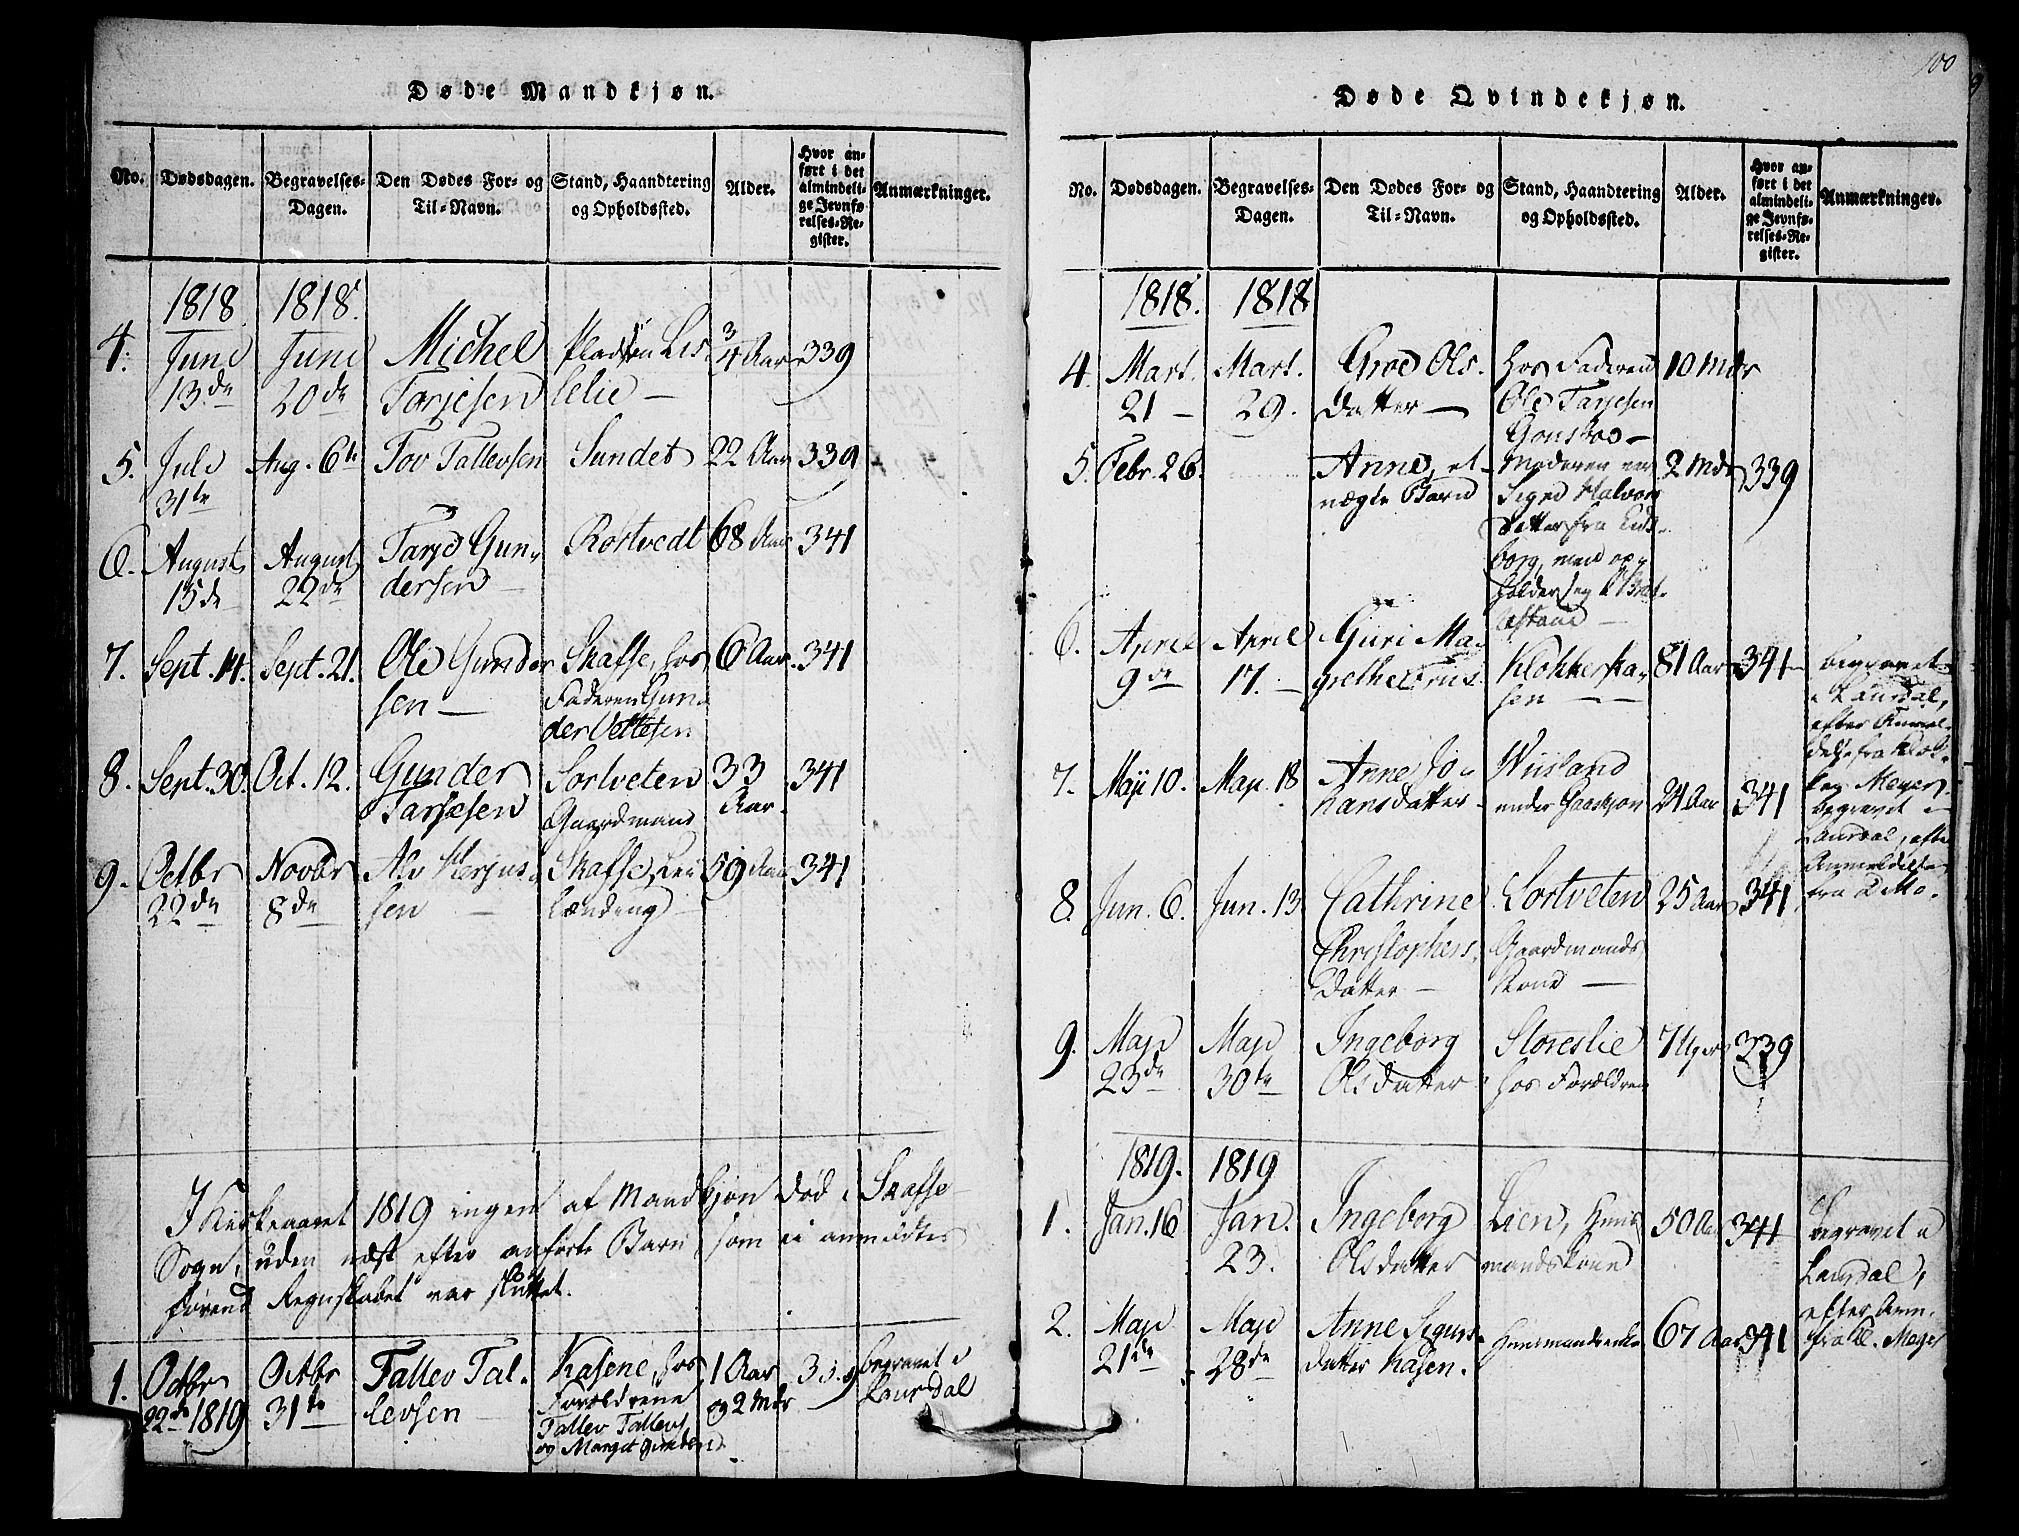 SAKO, Mo kirkebøker, F/Fb/L0001: Ministerialbok nr. II 1, 1814-1844, s. 100